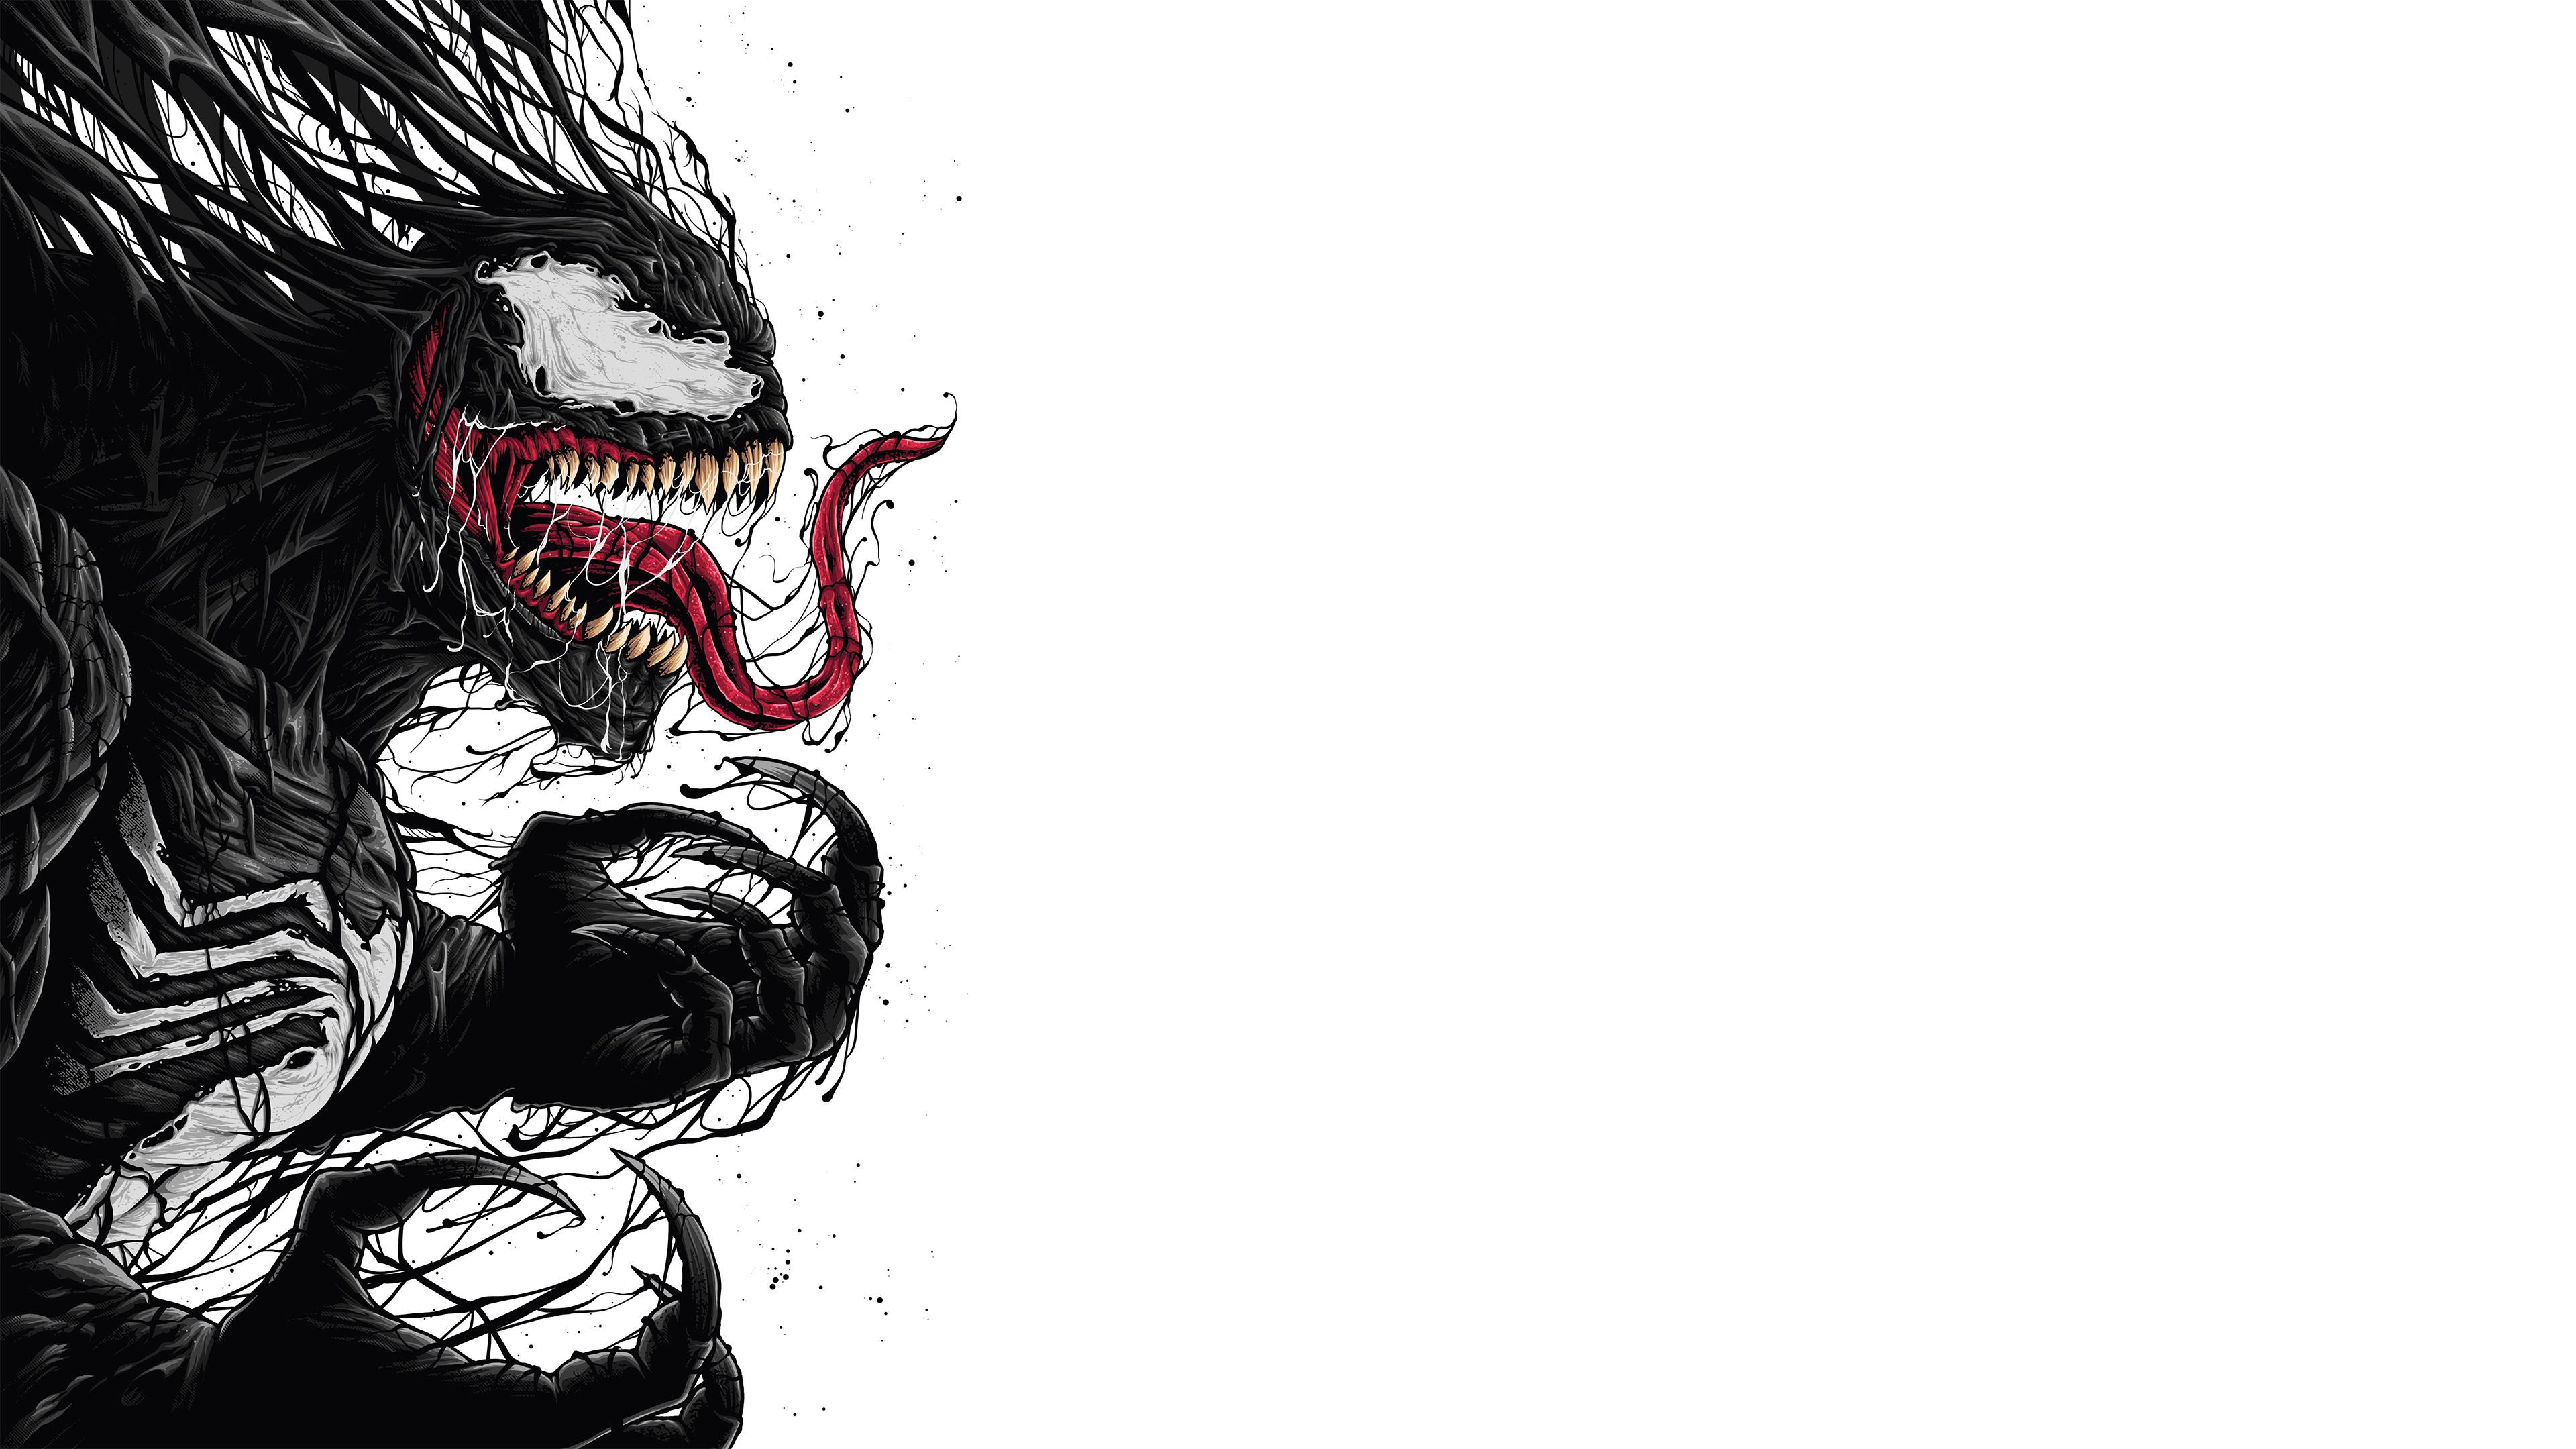 venom digital fan art 4k 1536524090 - Venom Digital Fan Art 4k - Venom wallpapers, supervillain wallpapers, superheroes wallpapers, hd-wallpapers, digital art wallpapers, behance wallpapers, artwork wallpapers, artist wallpapers, 4k-wallpapers